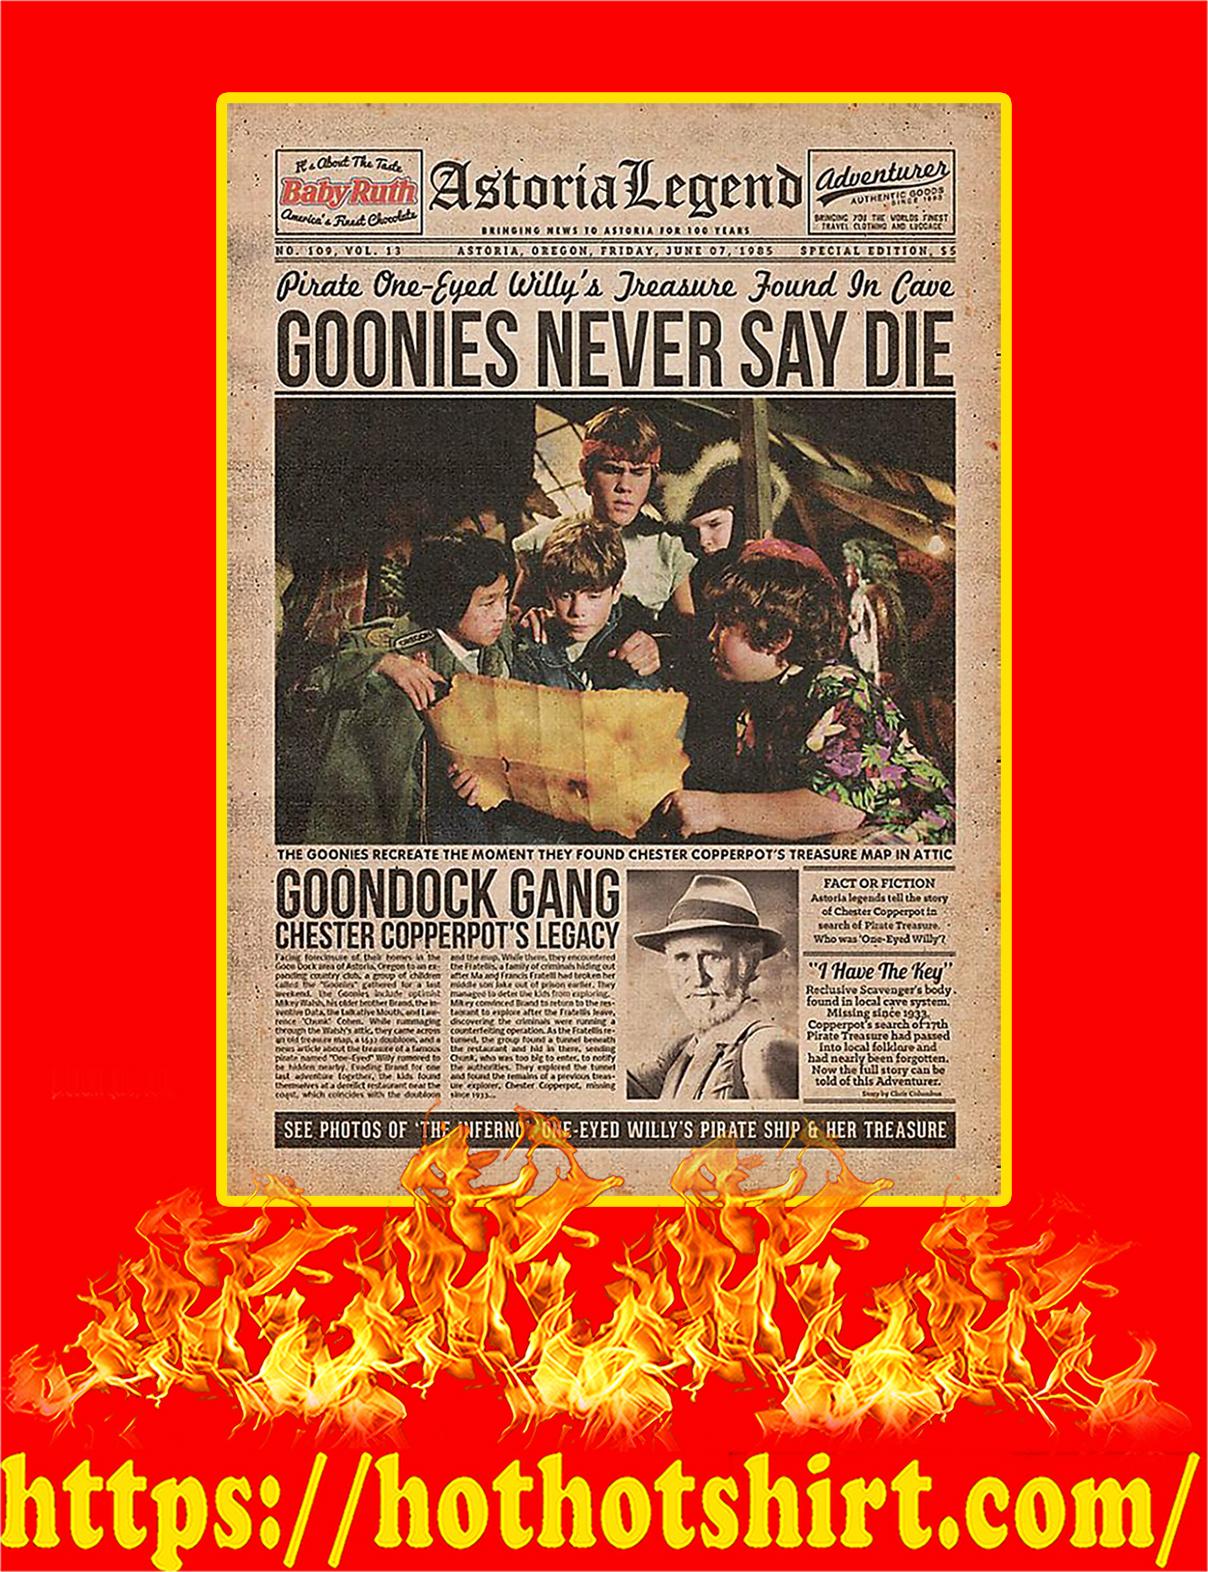 Goonies Never Say Die Poster - A3